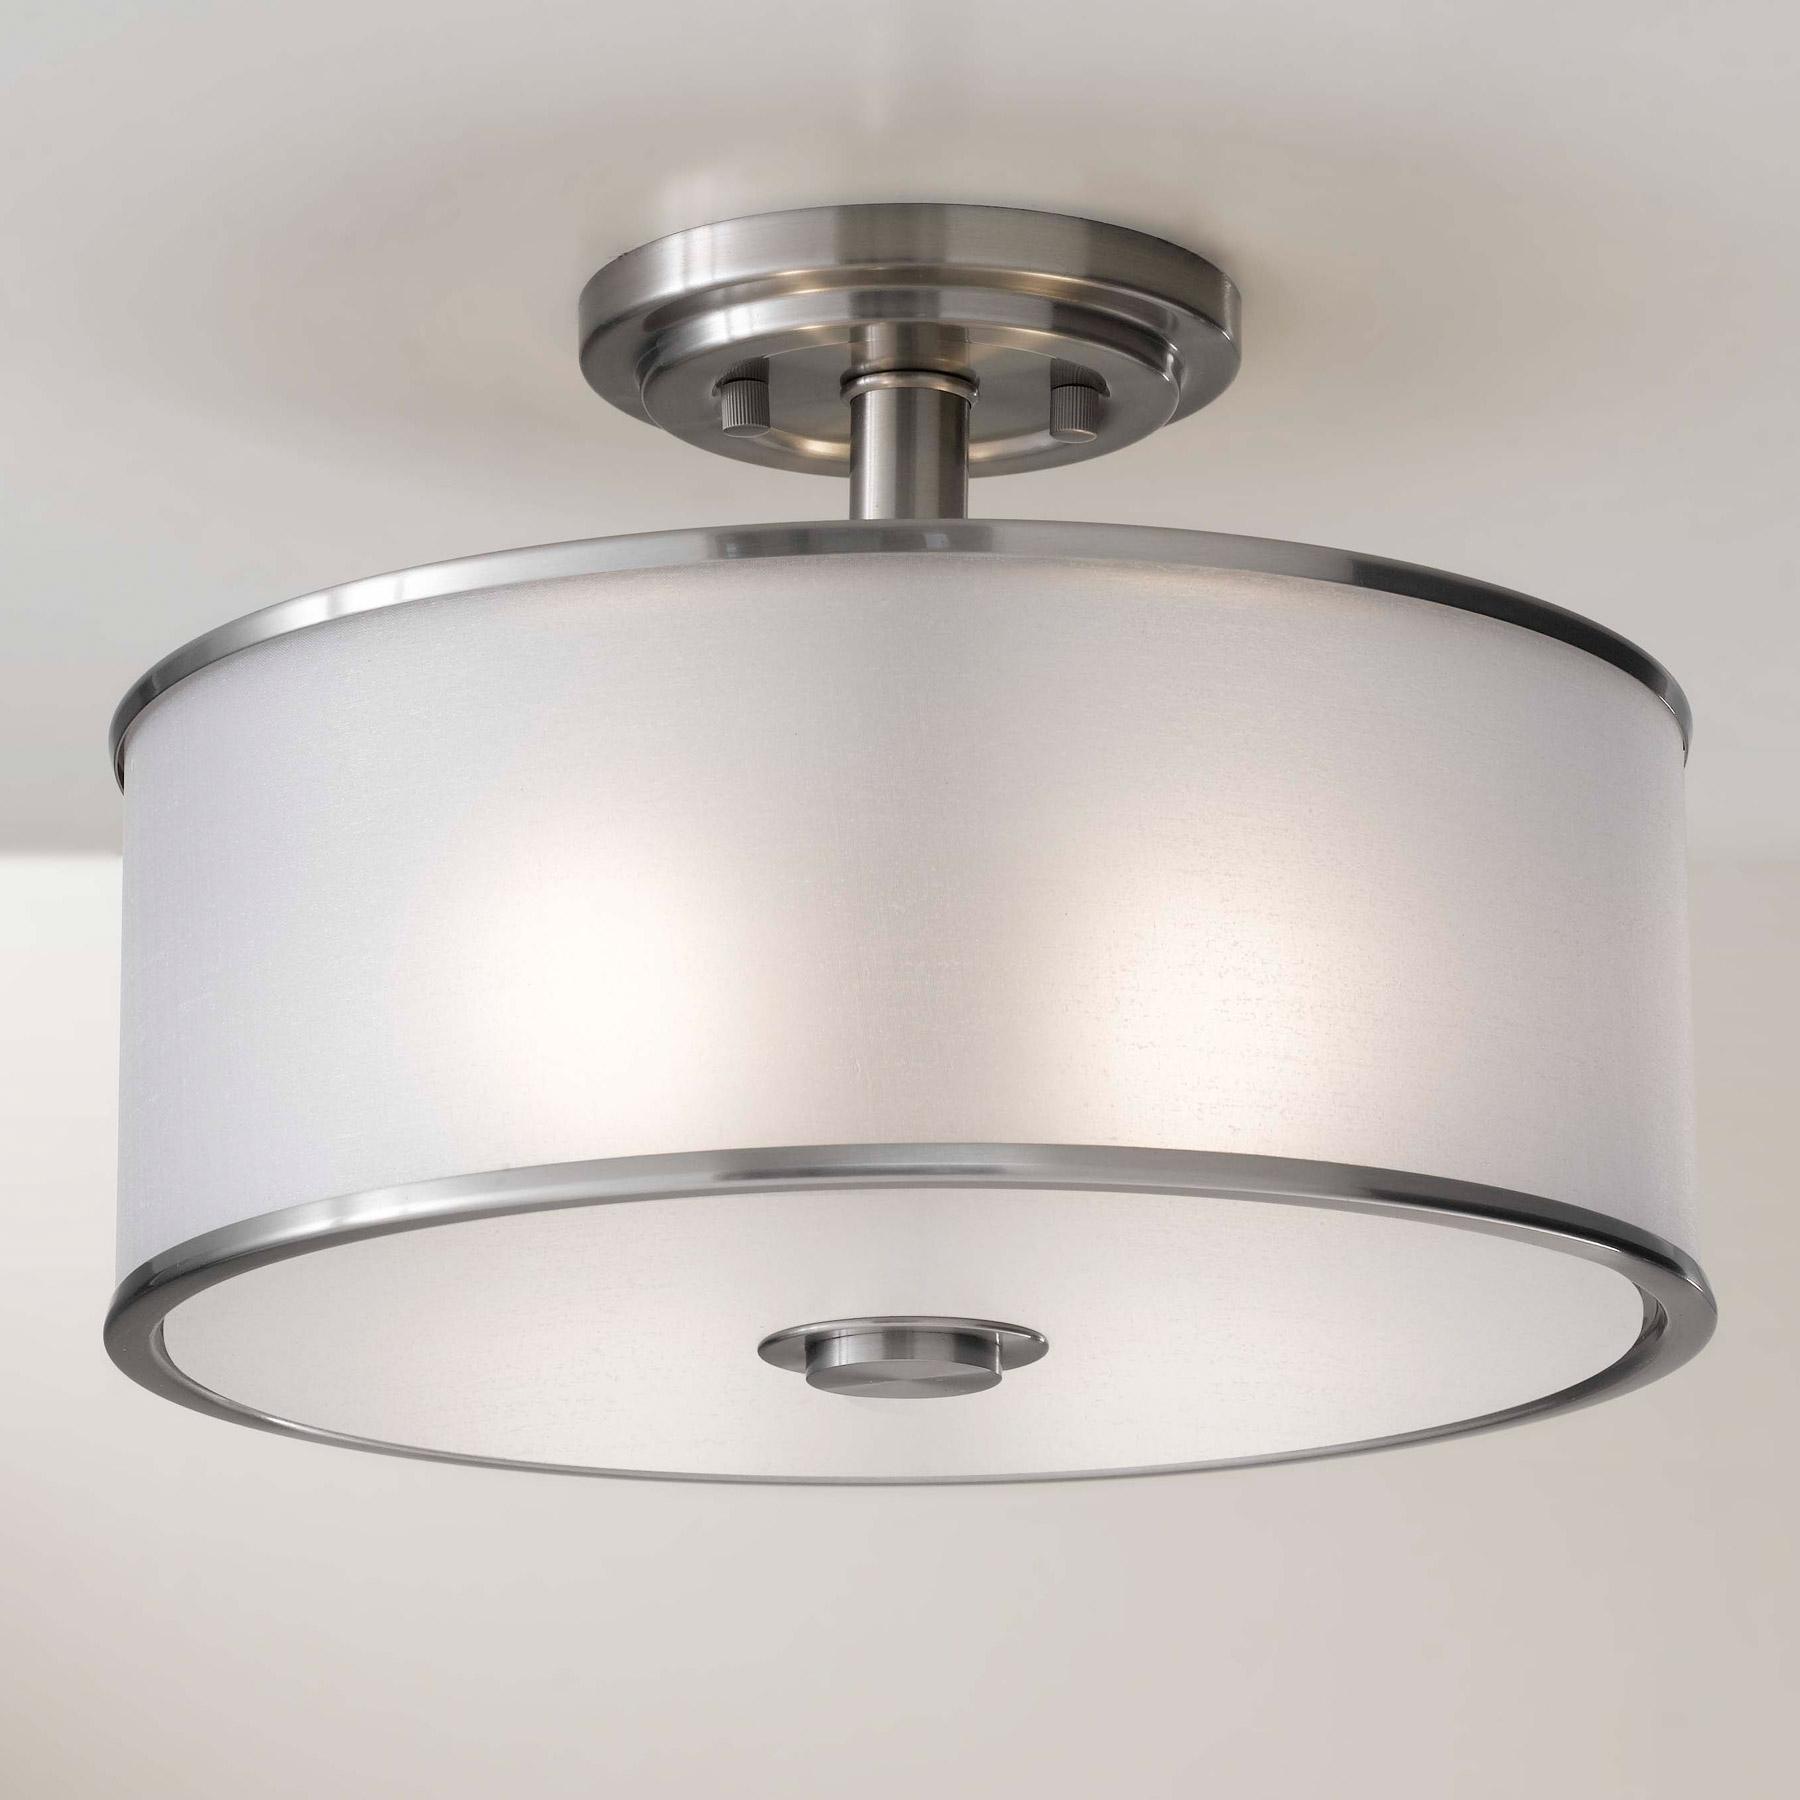 Murray Feiss Sf251bs Luxury Semi Flush Ceiling Fixture